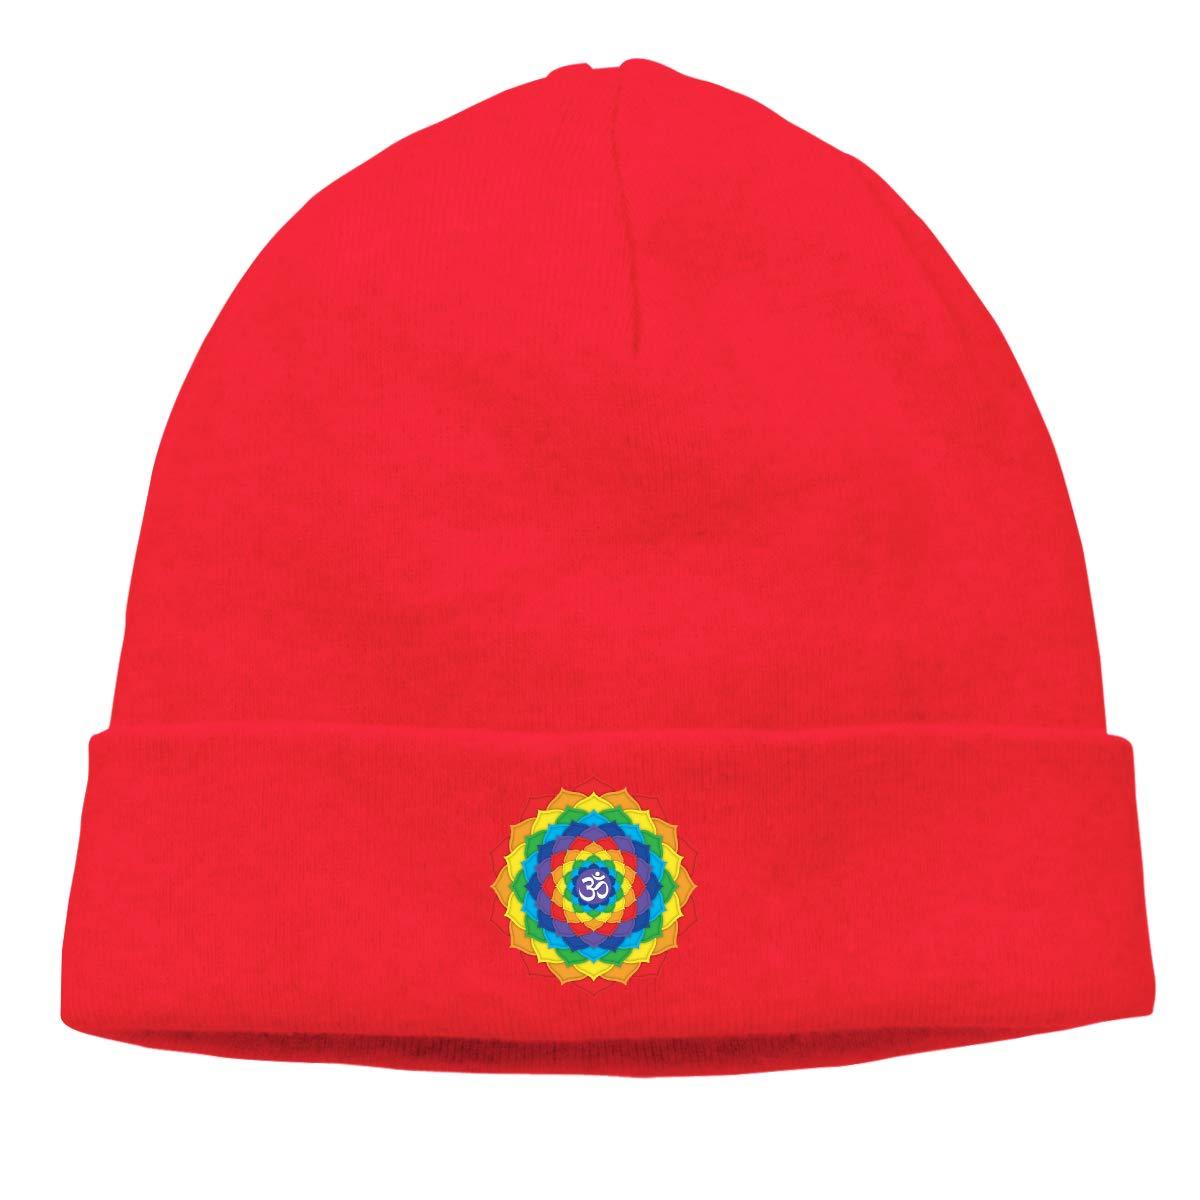 Simoner Rainbow Crown Chakra Warm Stretchy Solid Daily Skull Cap,Knit Wool Beanie Hat Black